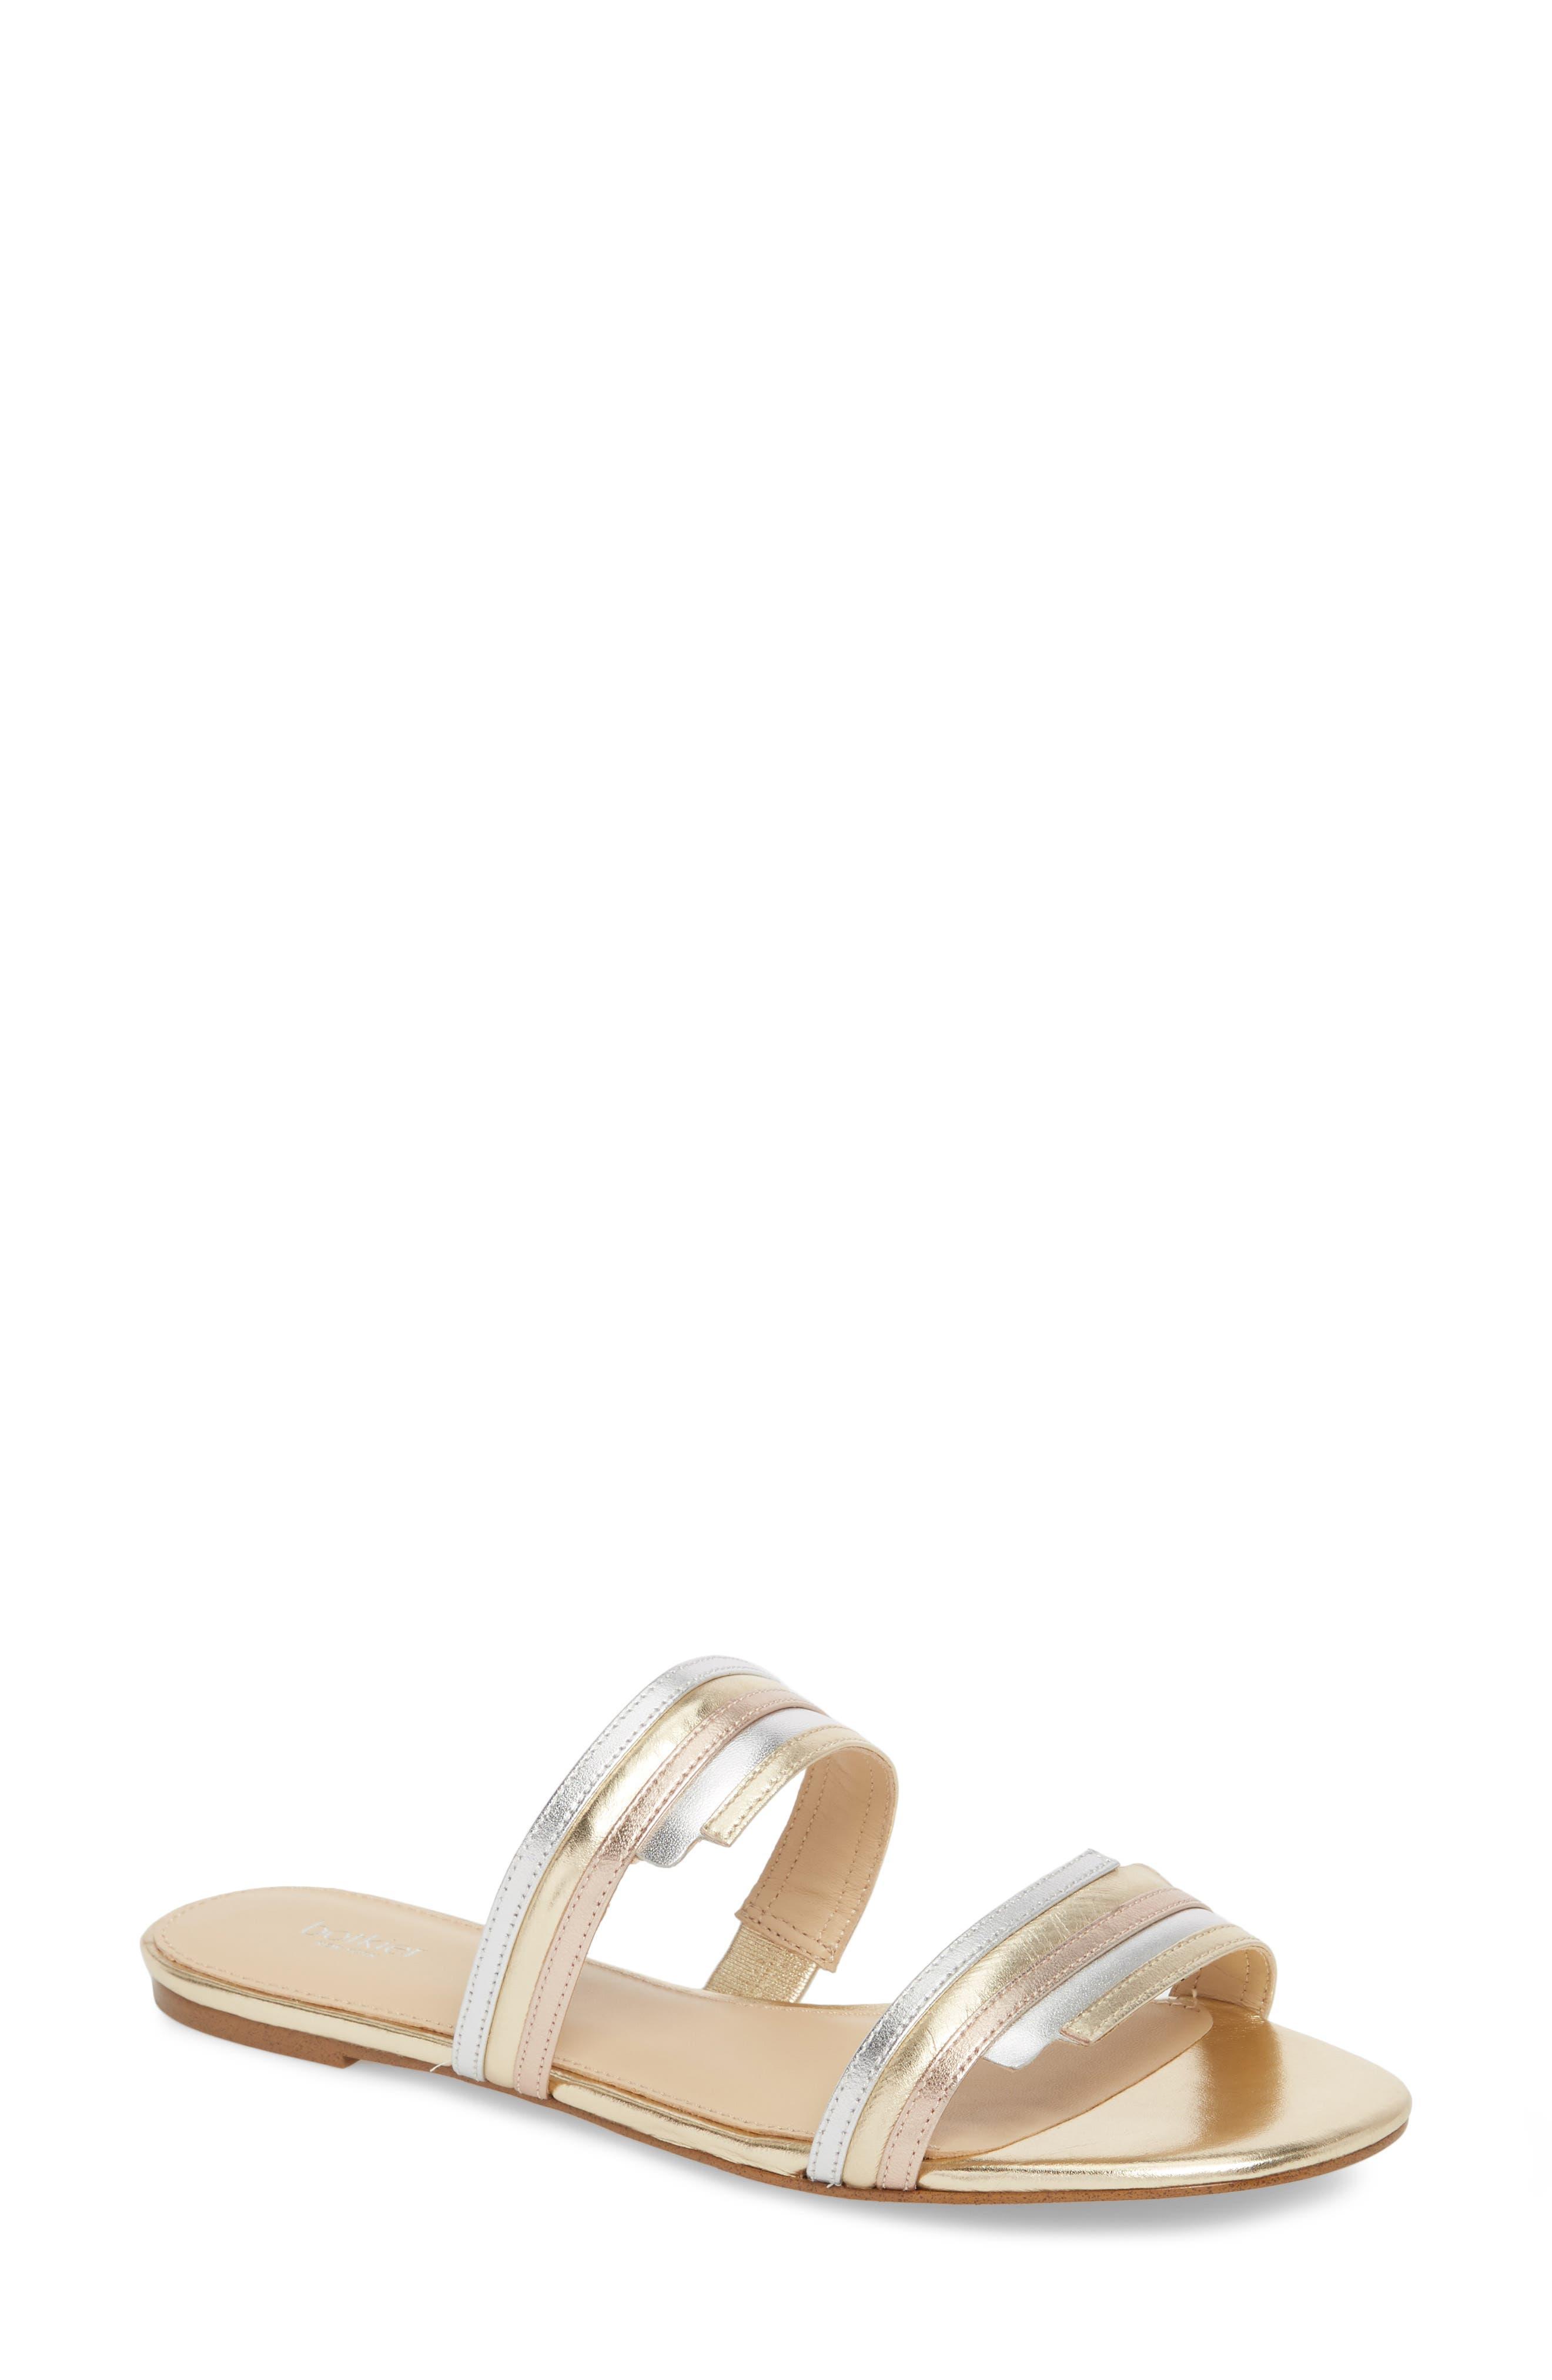 Maise Slide Sandal,                             Main thumbnail 1, color,                             Ivory Multi Leather